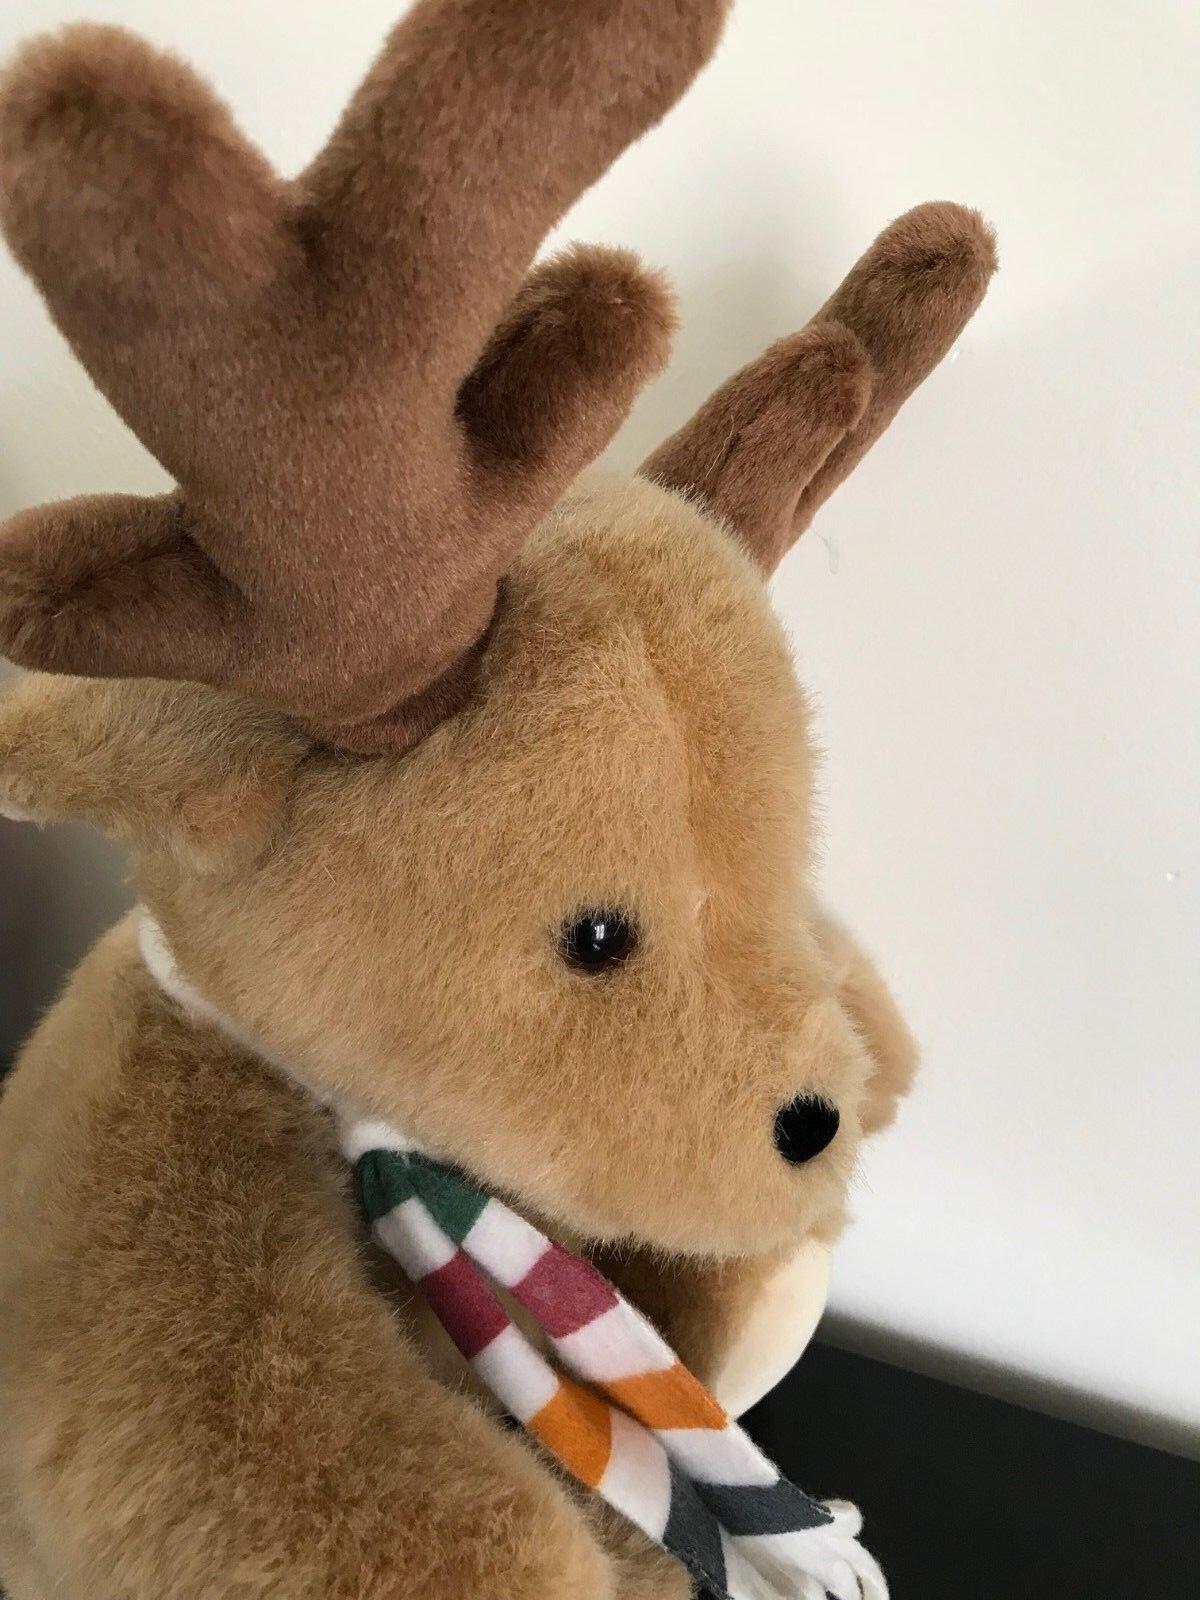 Hudsons Bay Company Vintage Reindeer Hudson Bay Scarf Scarf Scarf Stuffed Toy 13